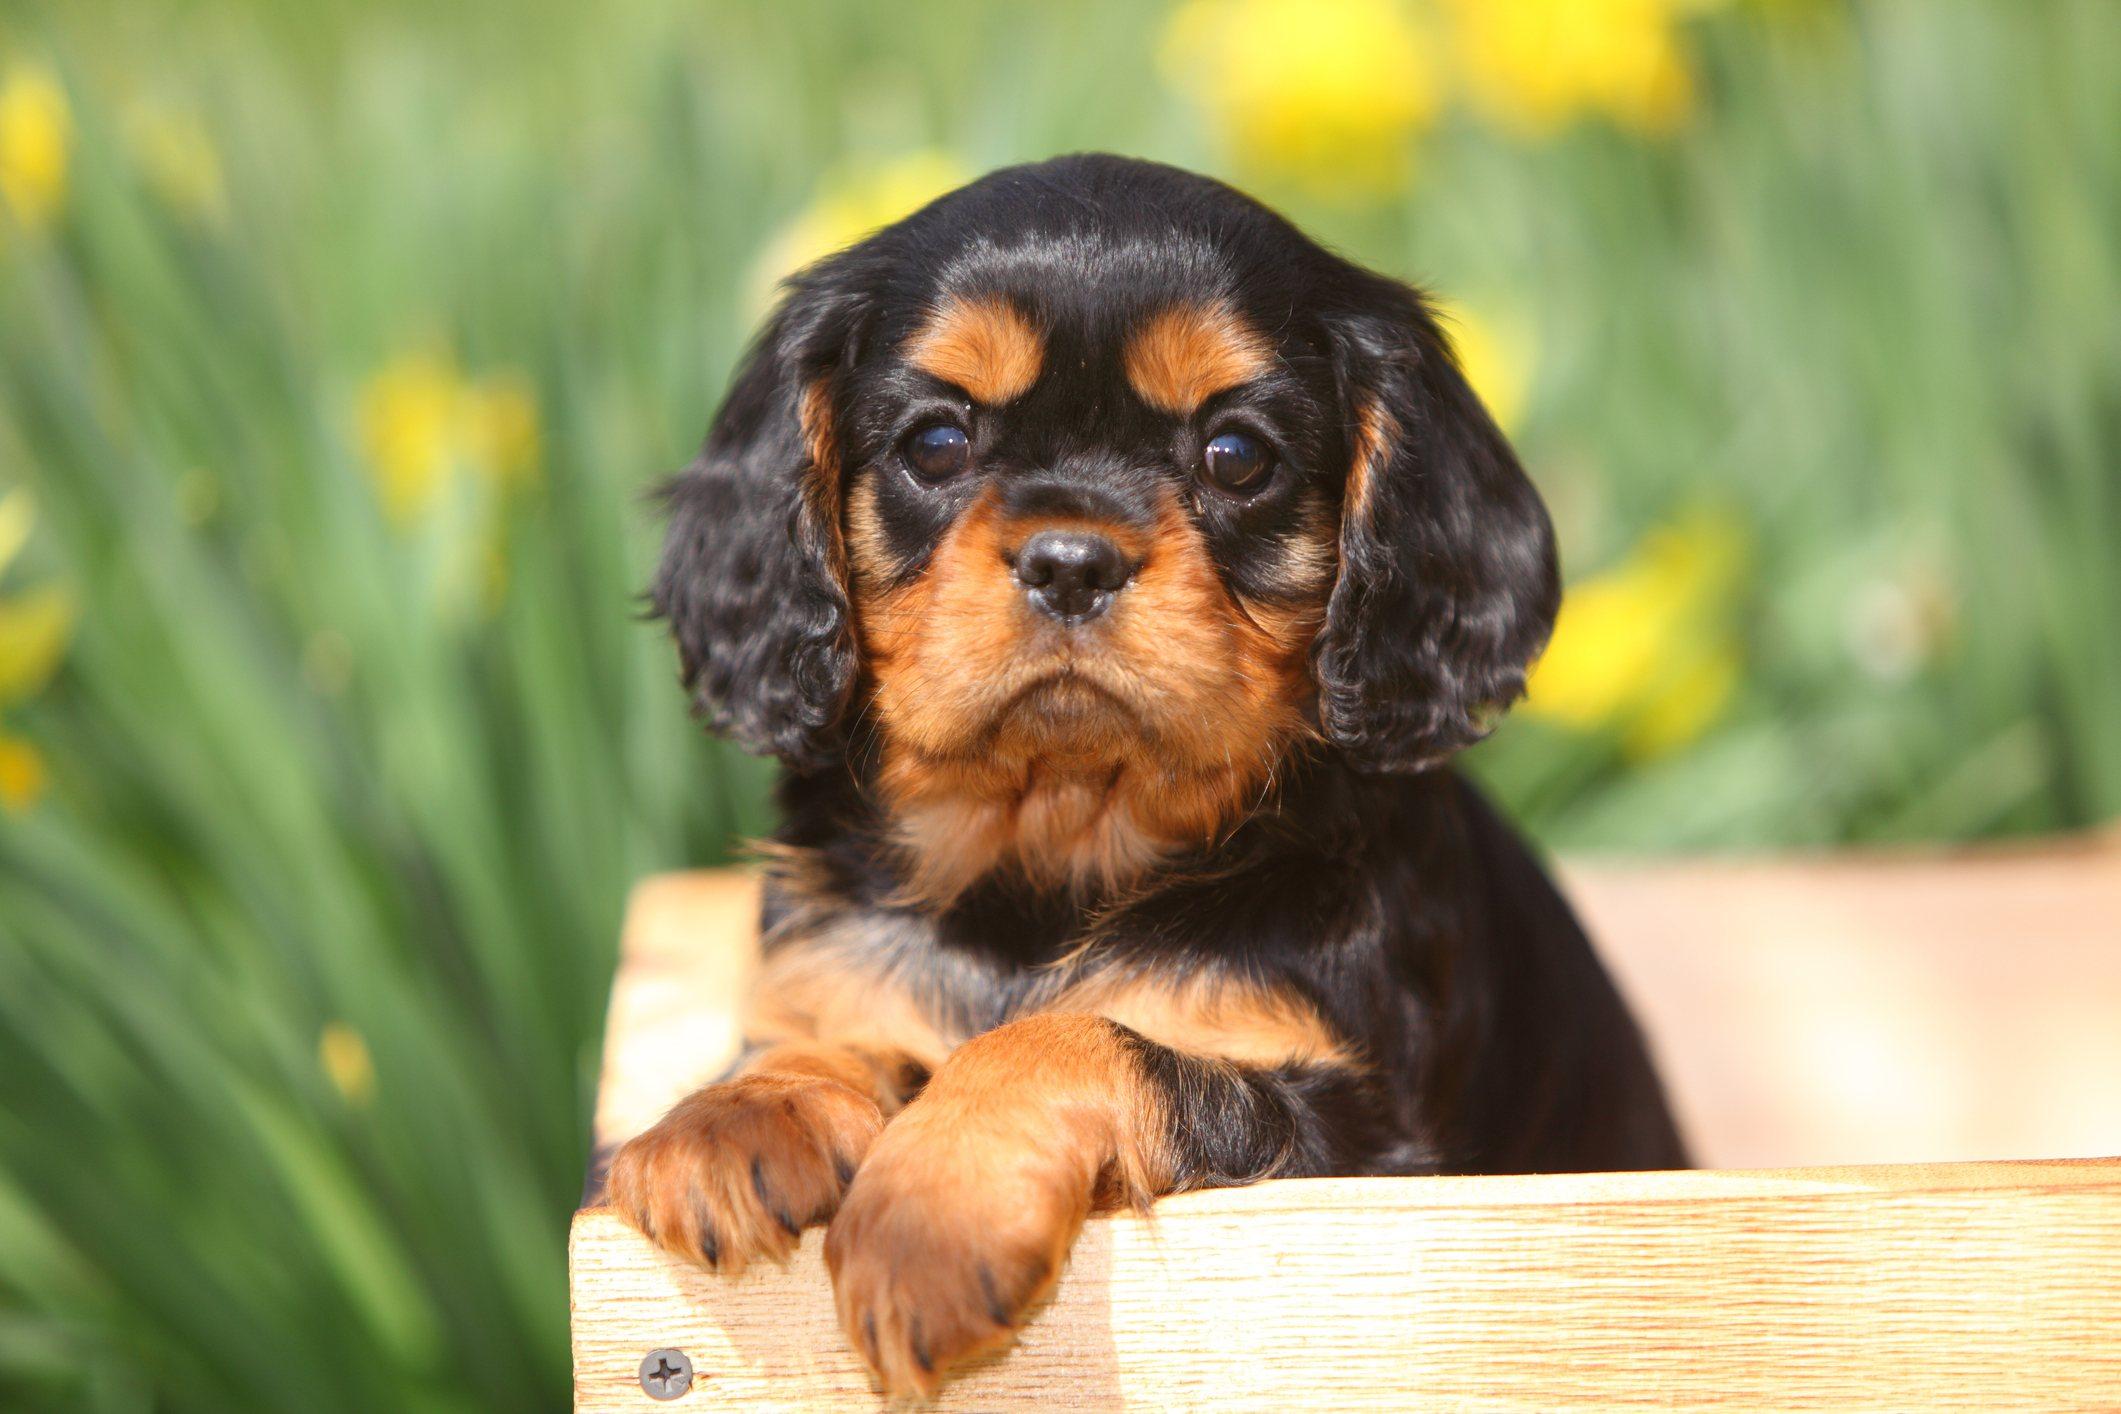 King Charles spaniel puppy